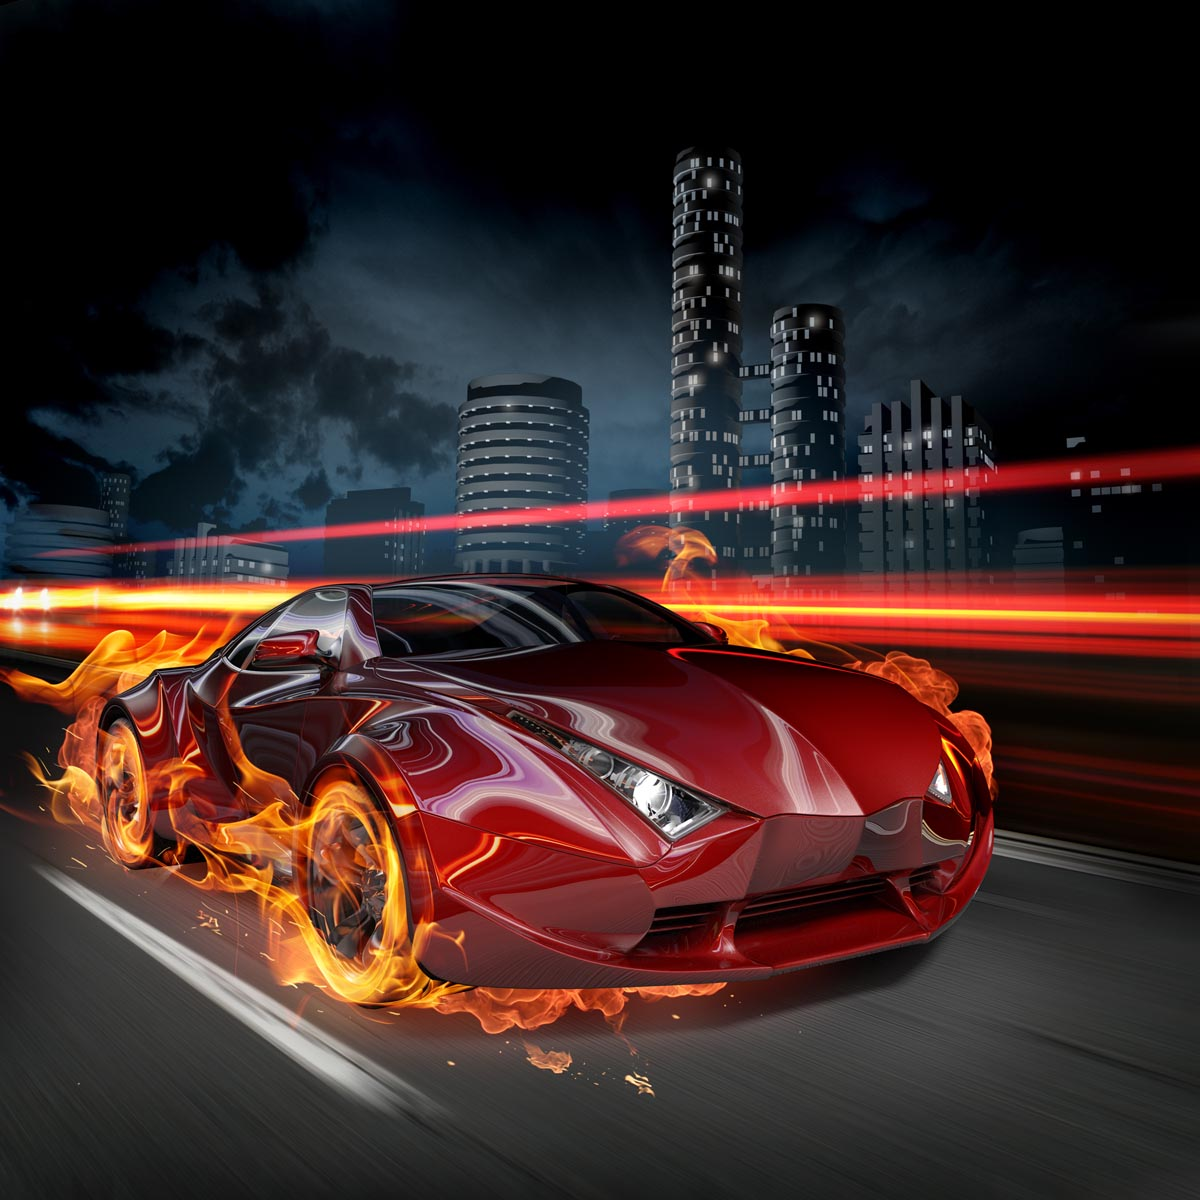 Fotobehang Coole Race Auto